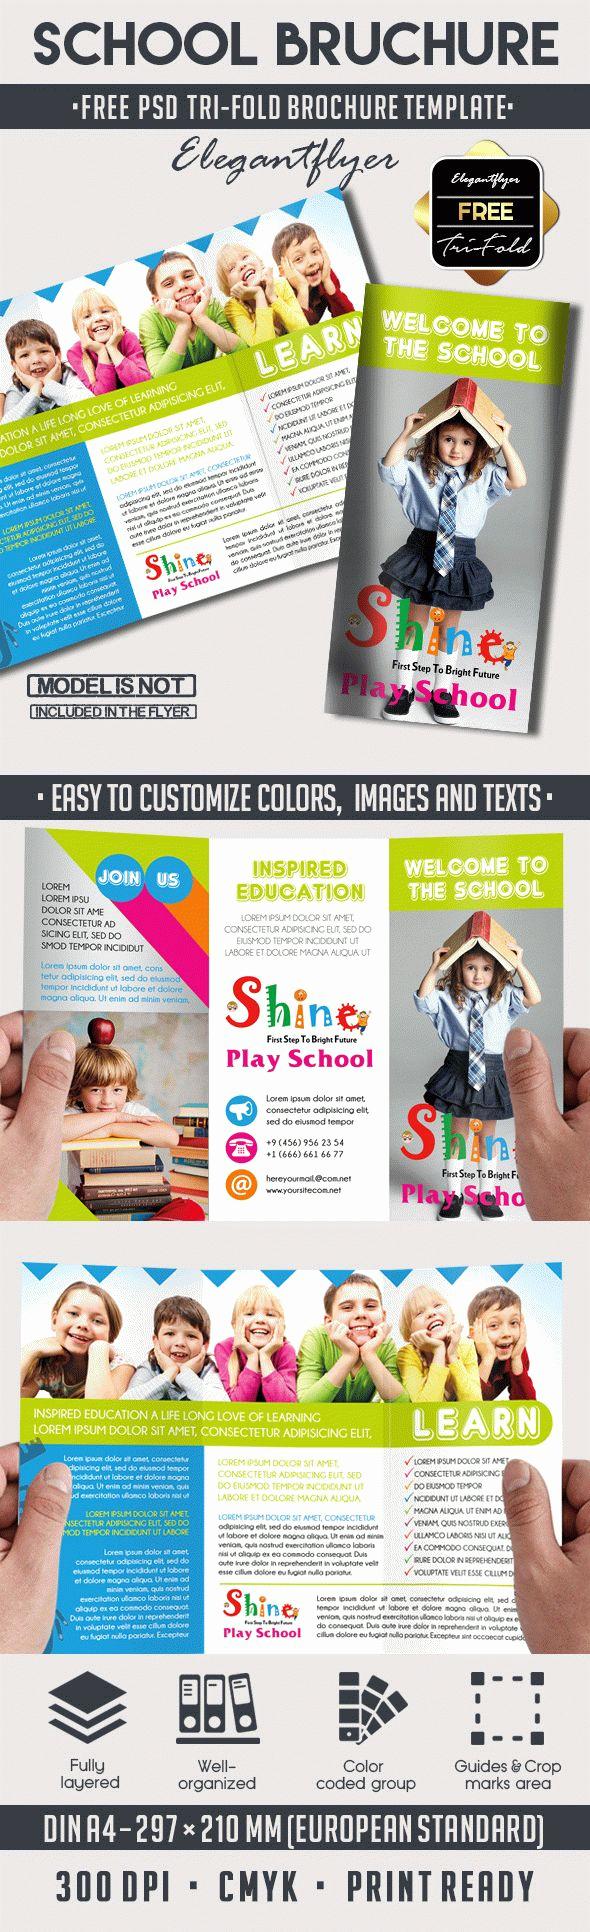 Tri Fold Brochure Template Psd Lovely School – Free Psd Tri Fold Psd Brochure Template – by